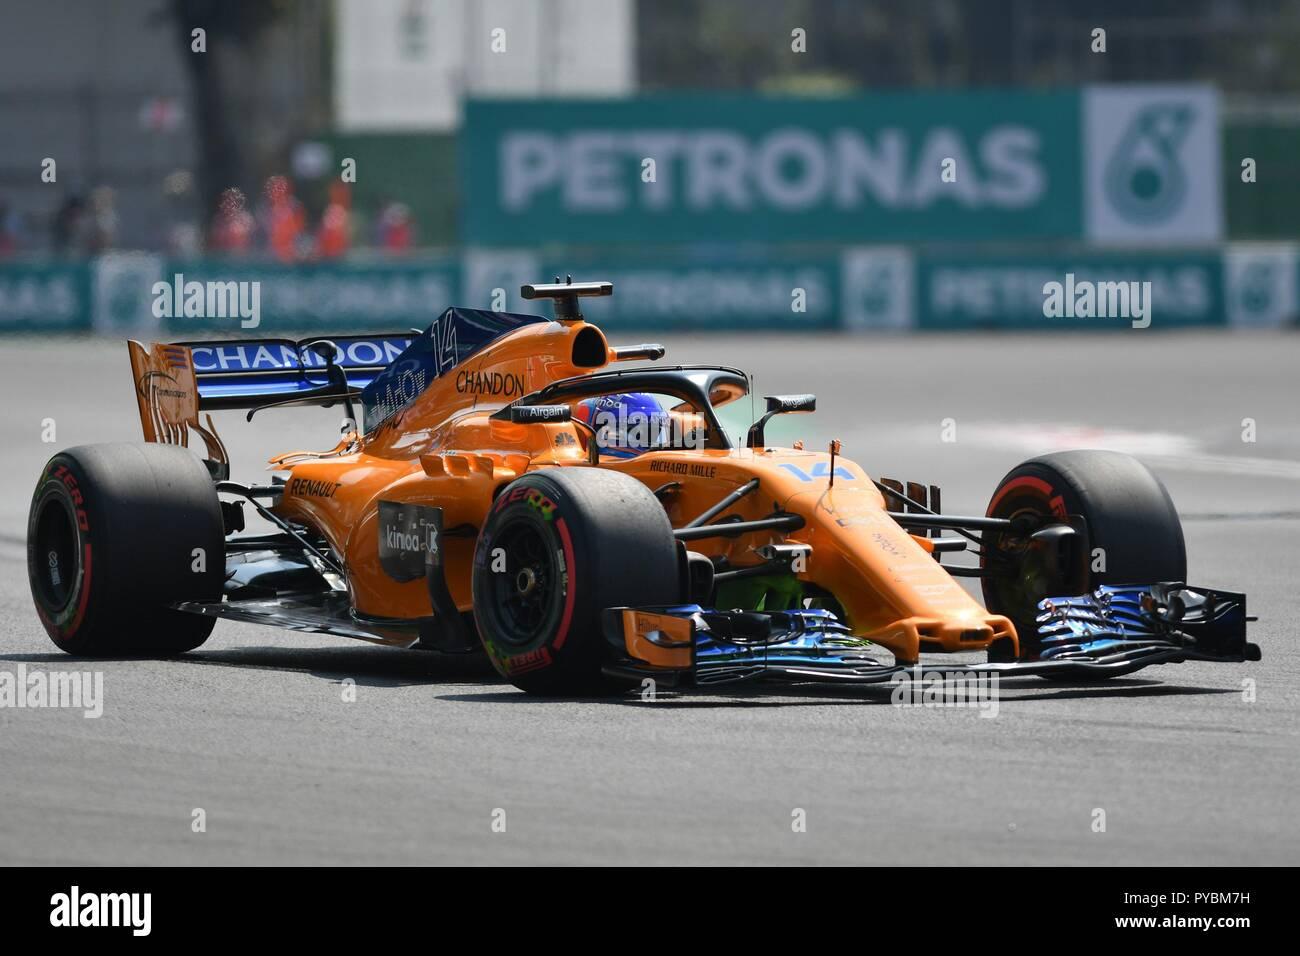 Fernando Alonso Mclaren F1 Team Stock Photos & Fernando